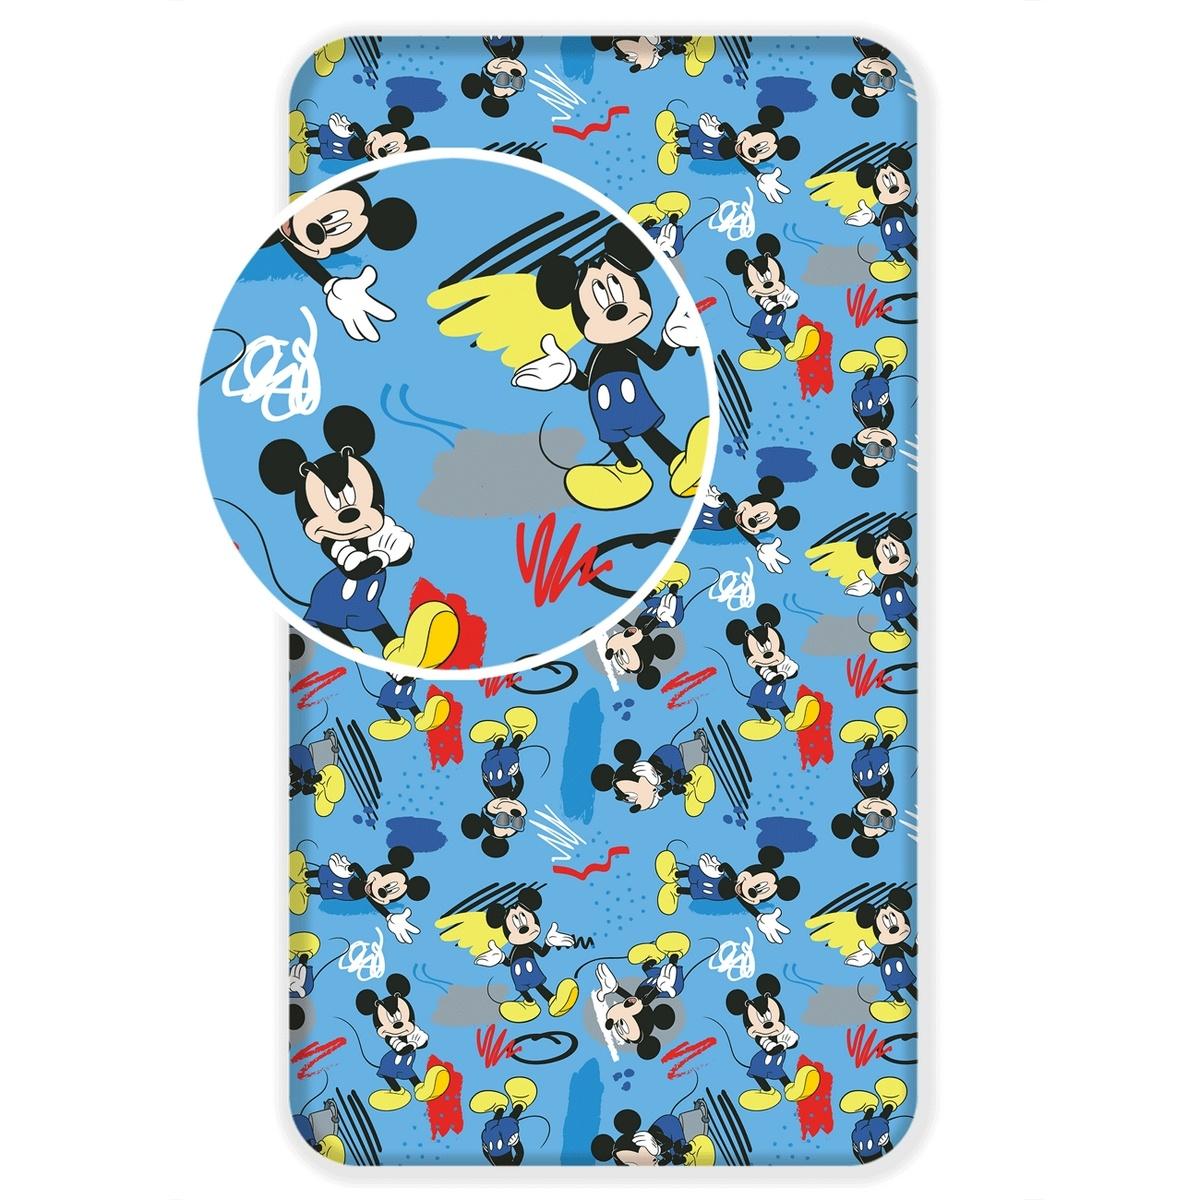 Jerry Fabrics Detské bavlnené prestieradlo Mickey 043, 90 x 200 cm